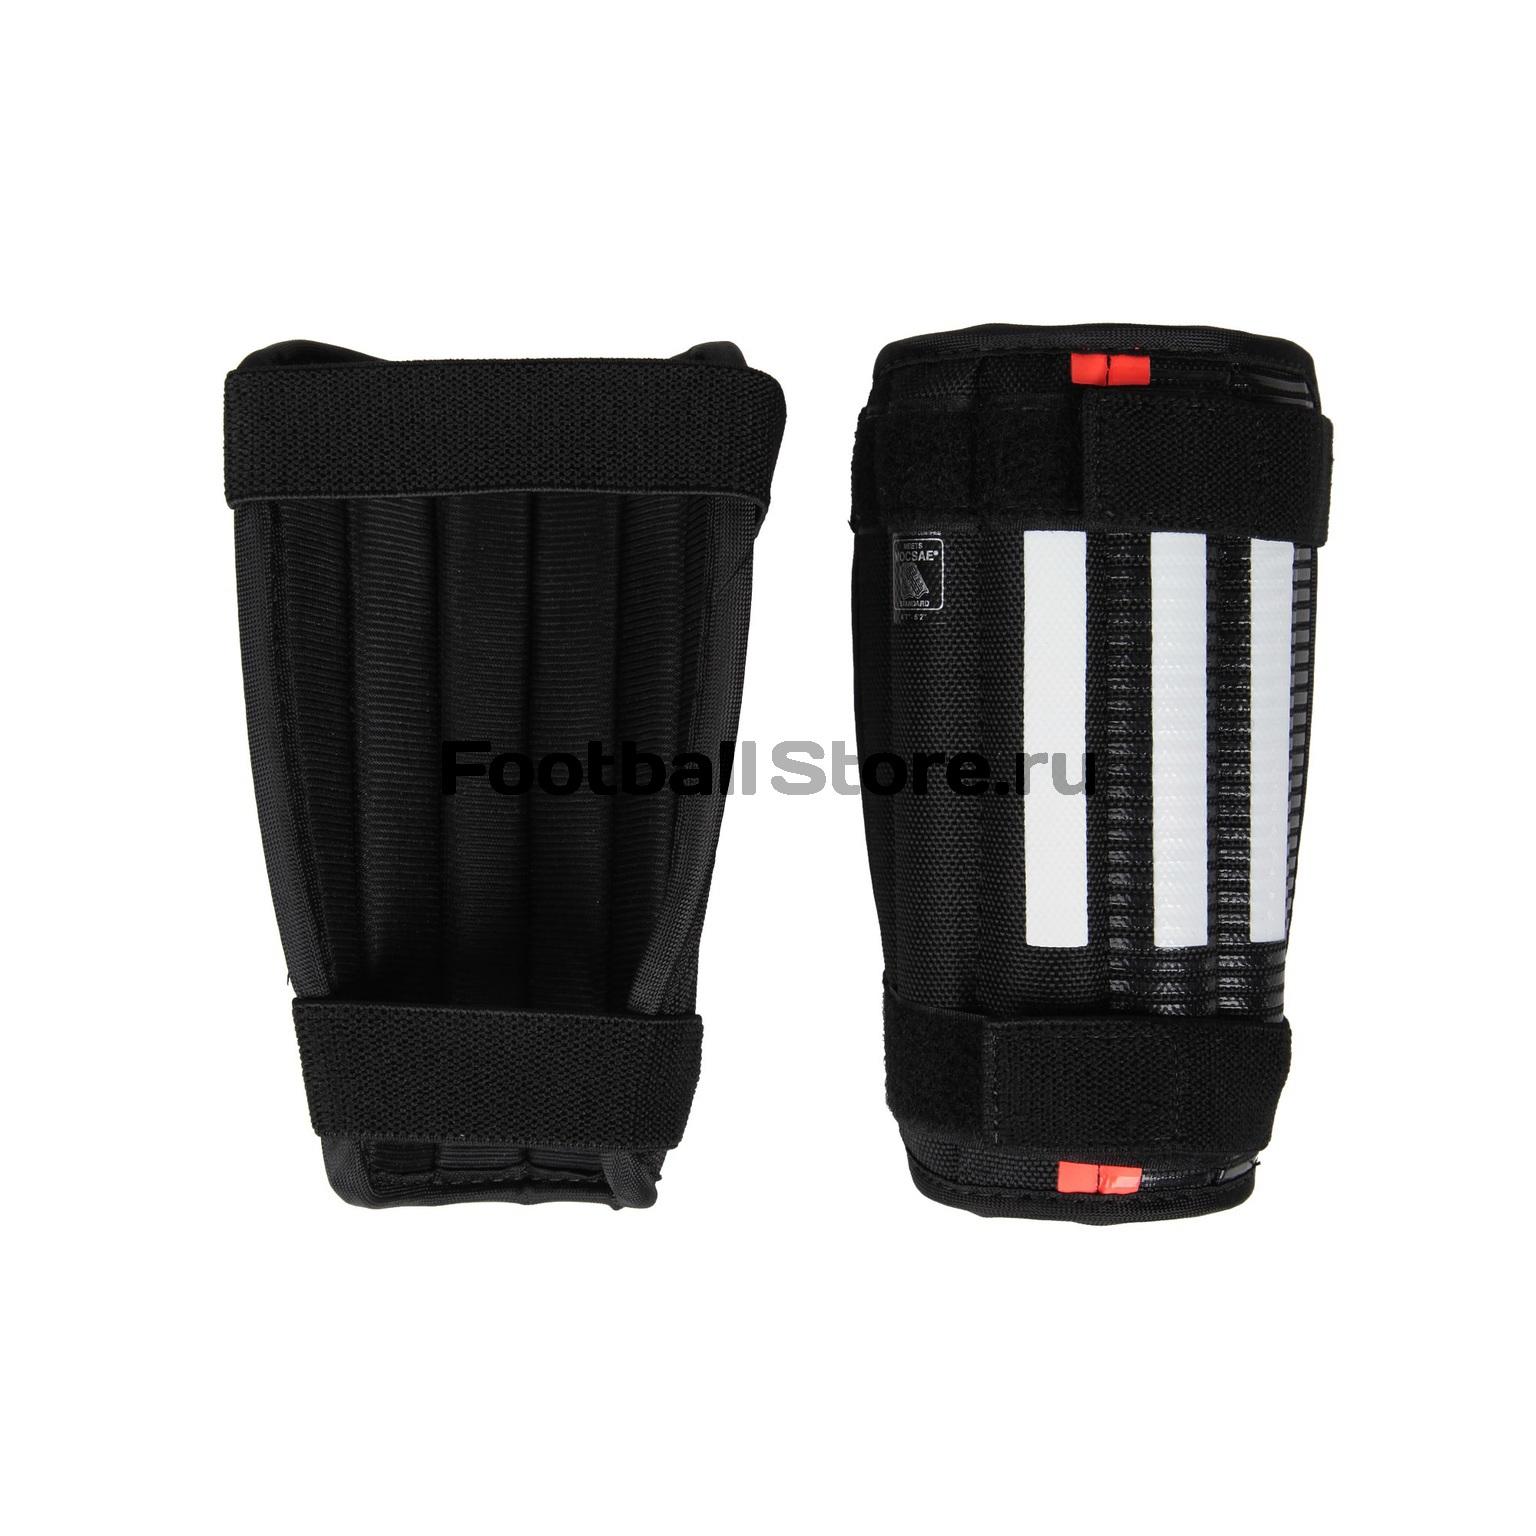 Щитки Adidas 11Anatomic Lite M38630 adidas adidas 11anatomic lite shin guards